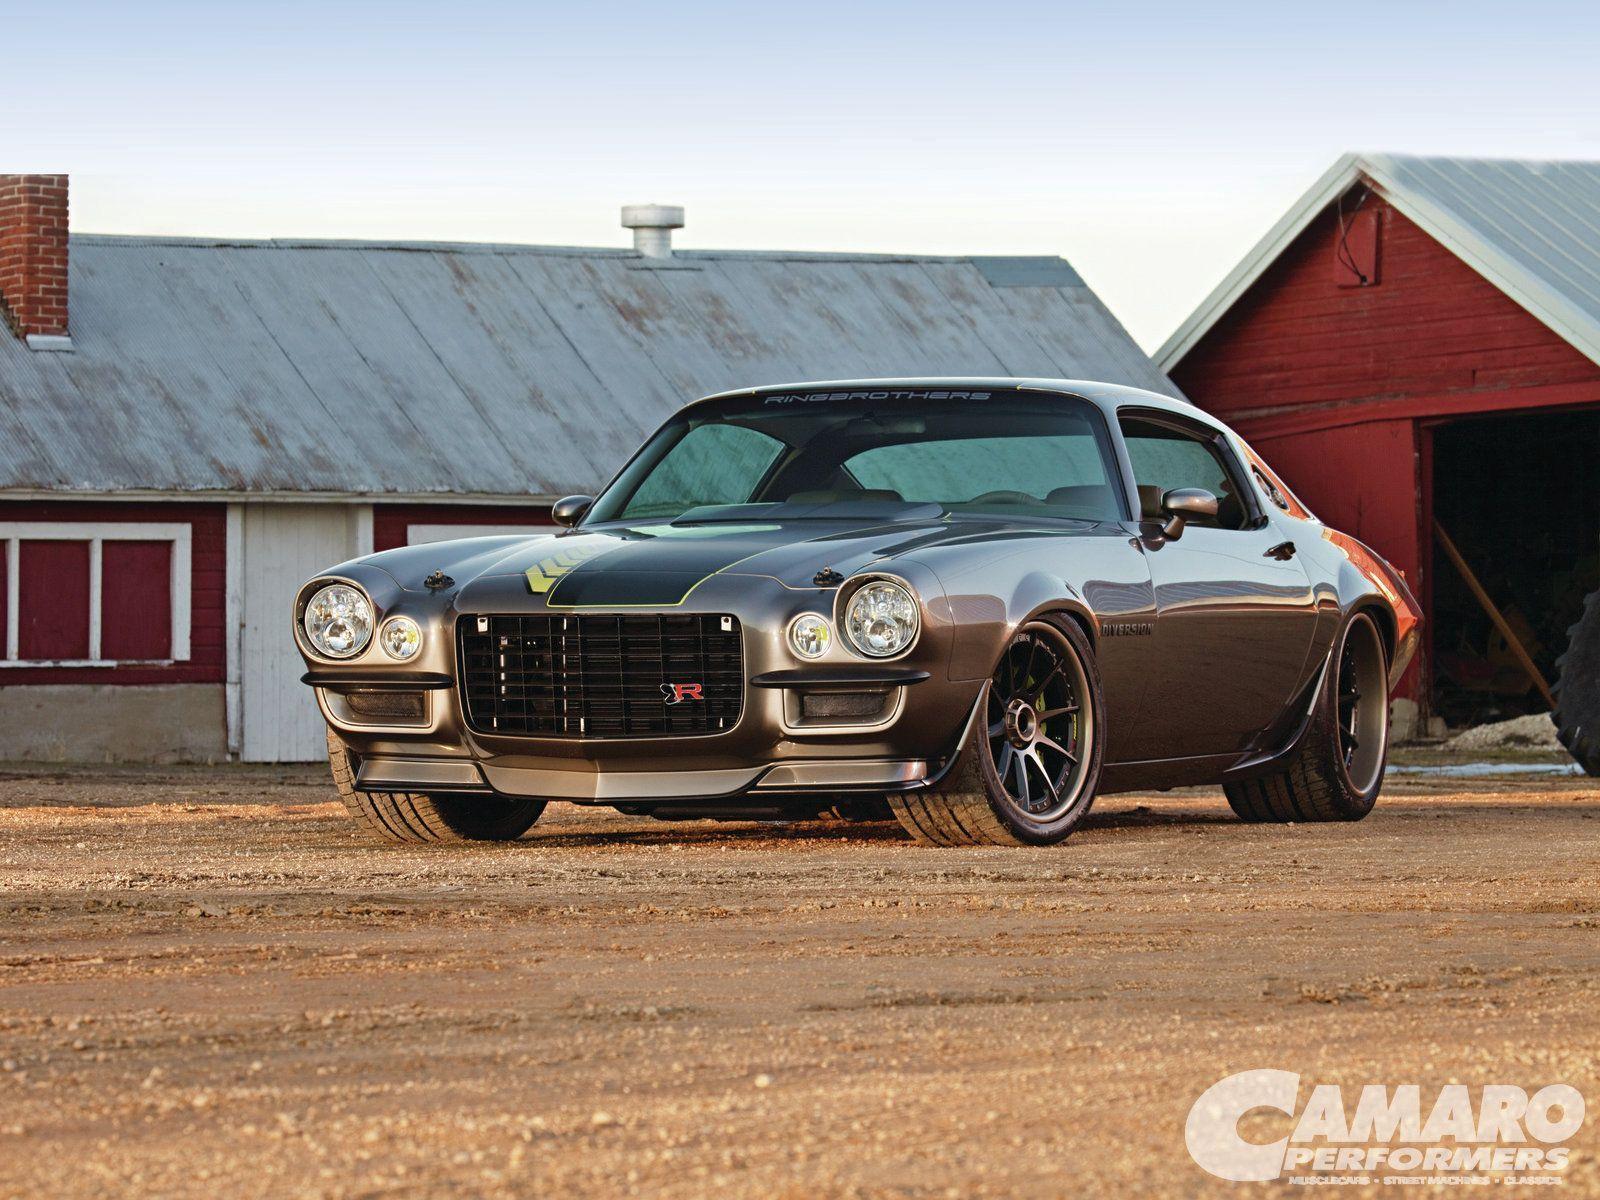 1970 Chevrolet Camaro | Bob Venne's Ringbrothers